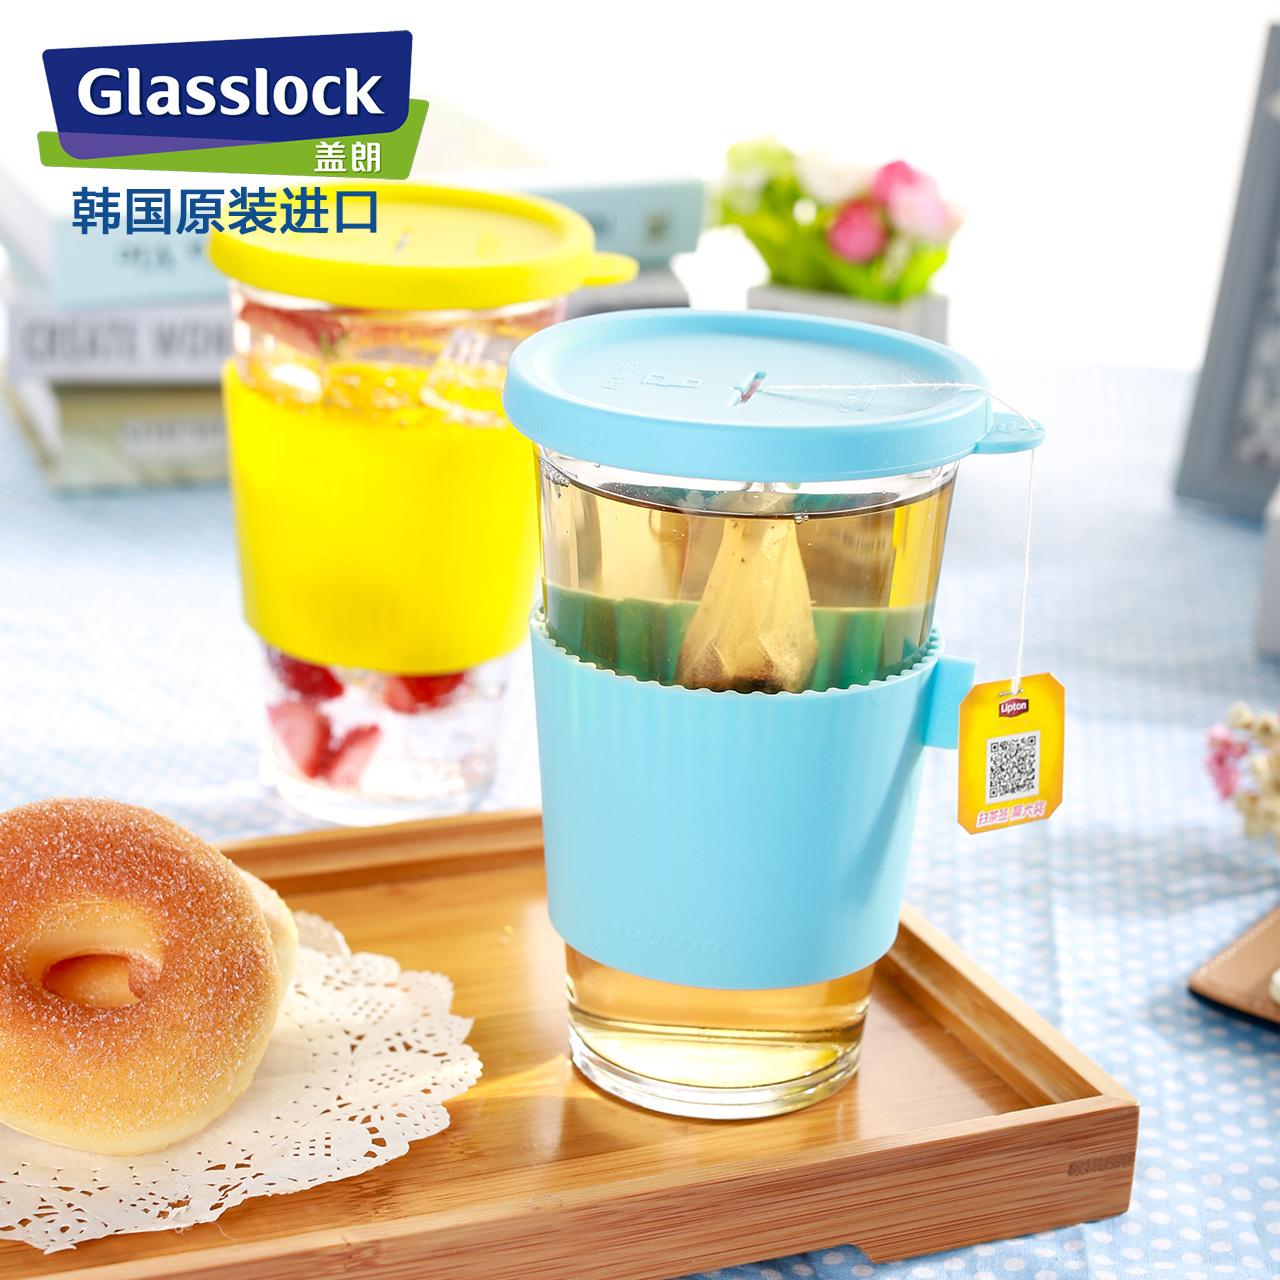 Glasslock 耐热透明钢化玻璃杯1元优惠券